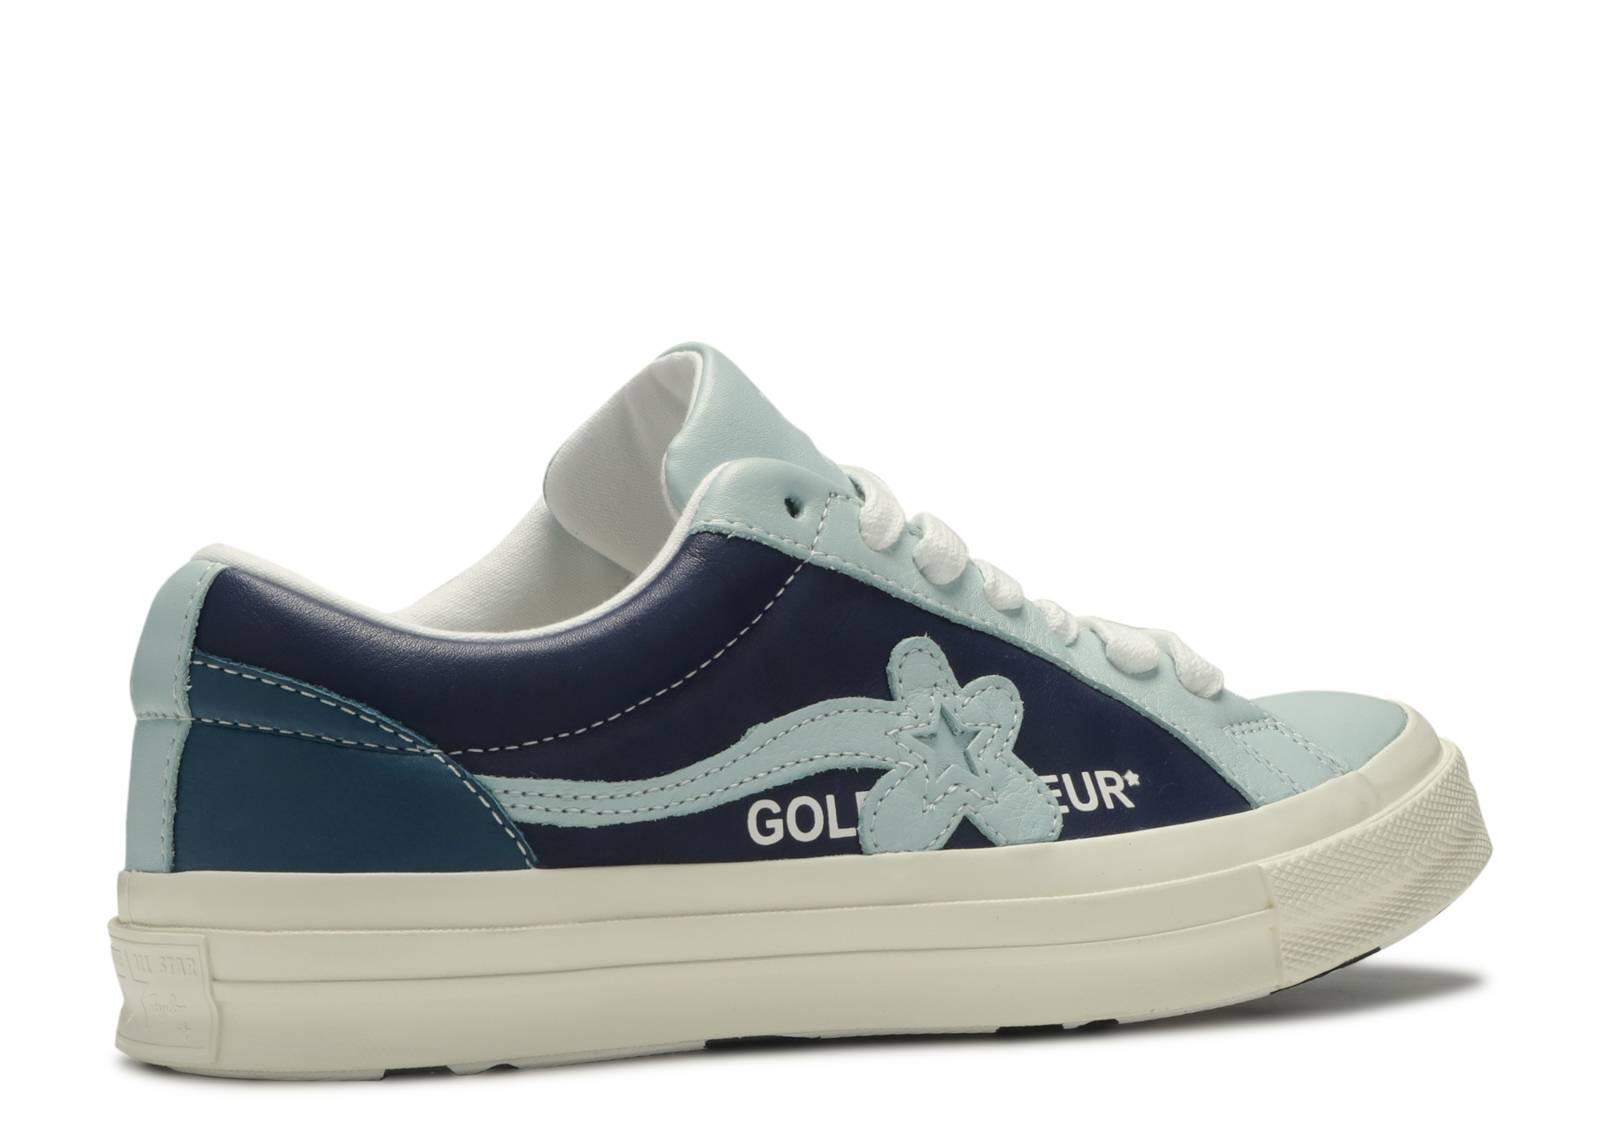 Golf Le Fleur X One Star Ox Industrial Pack Blue Converse 164024c Barely Blue Patriot Egret Flight Club